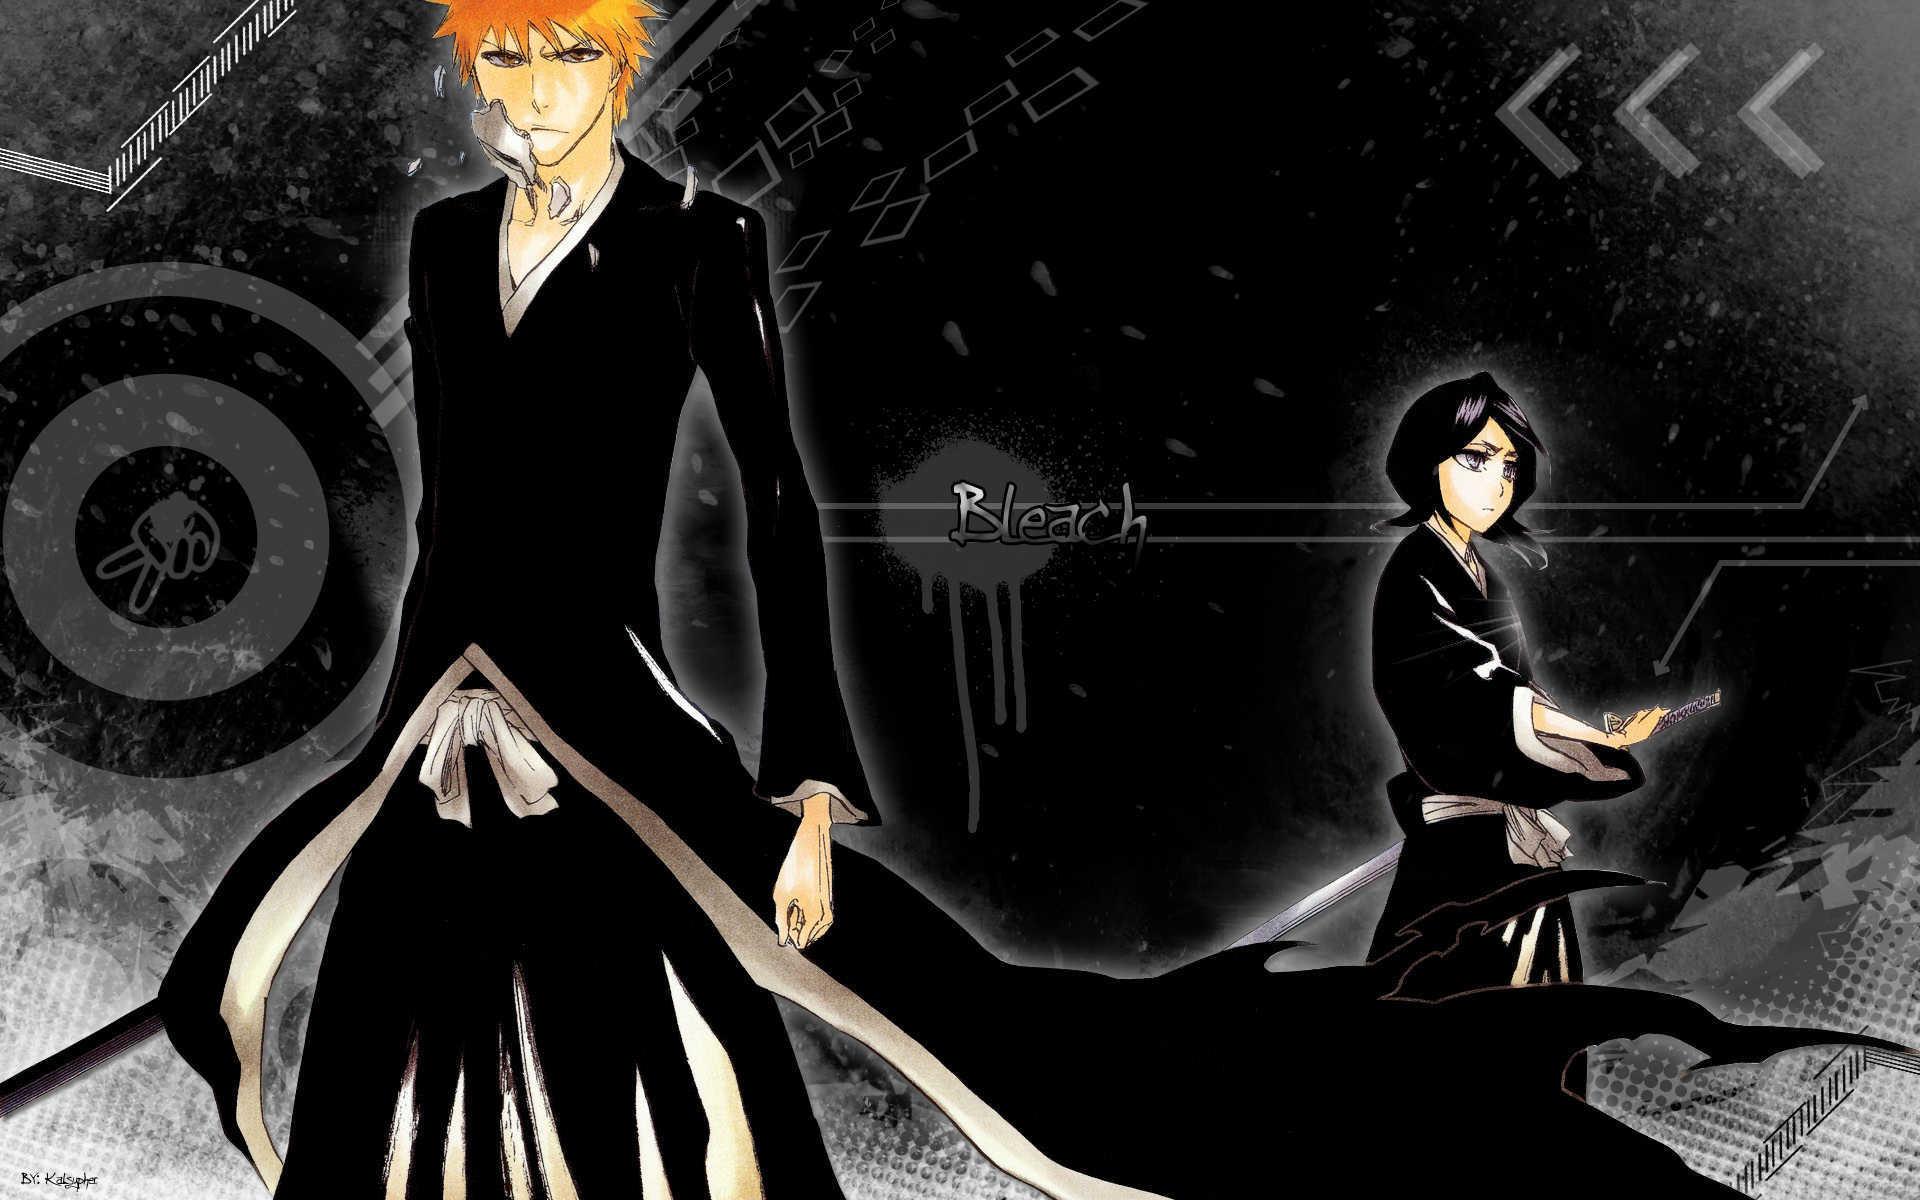 Unique Bleach Anime Wallpaper Download Design Anime Wallpaper Hd Free